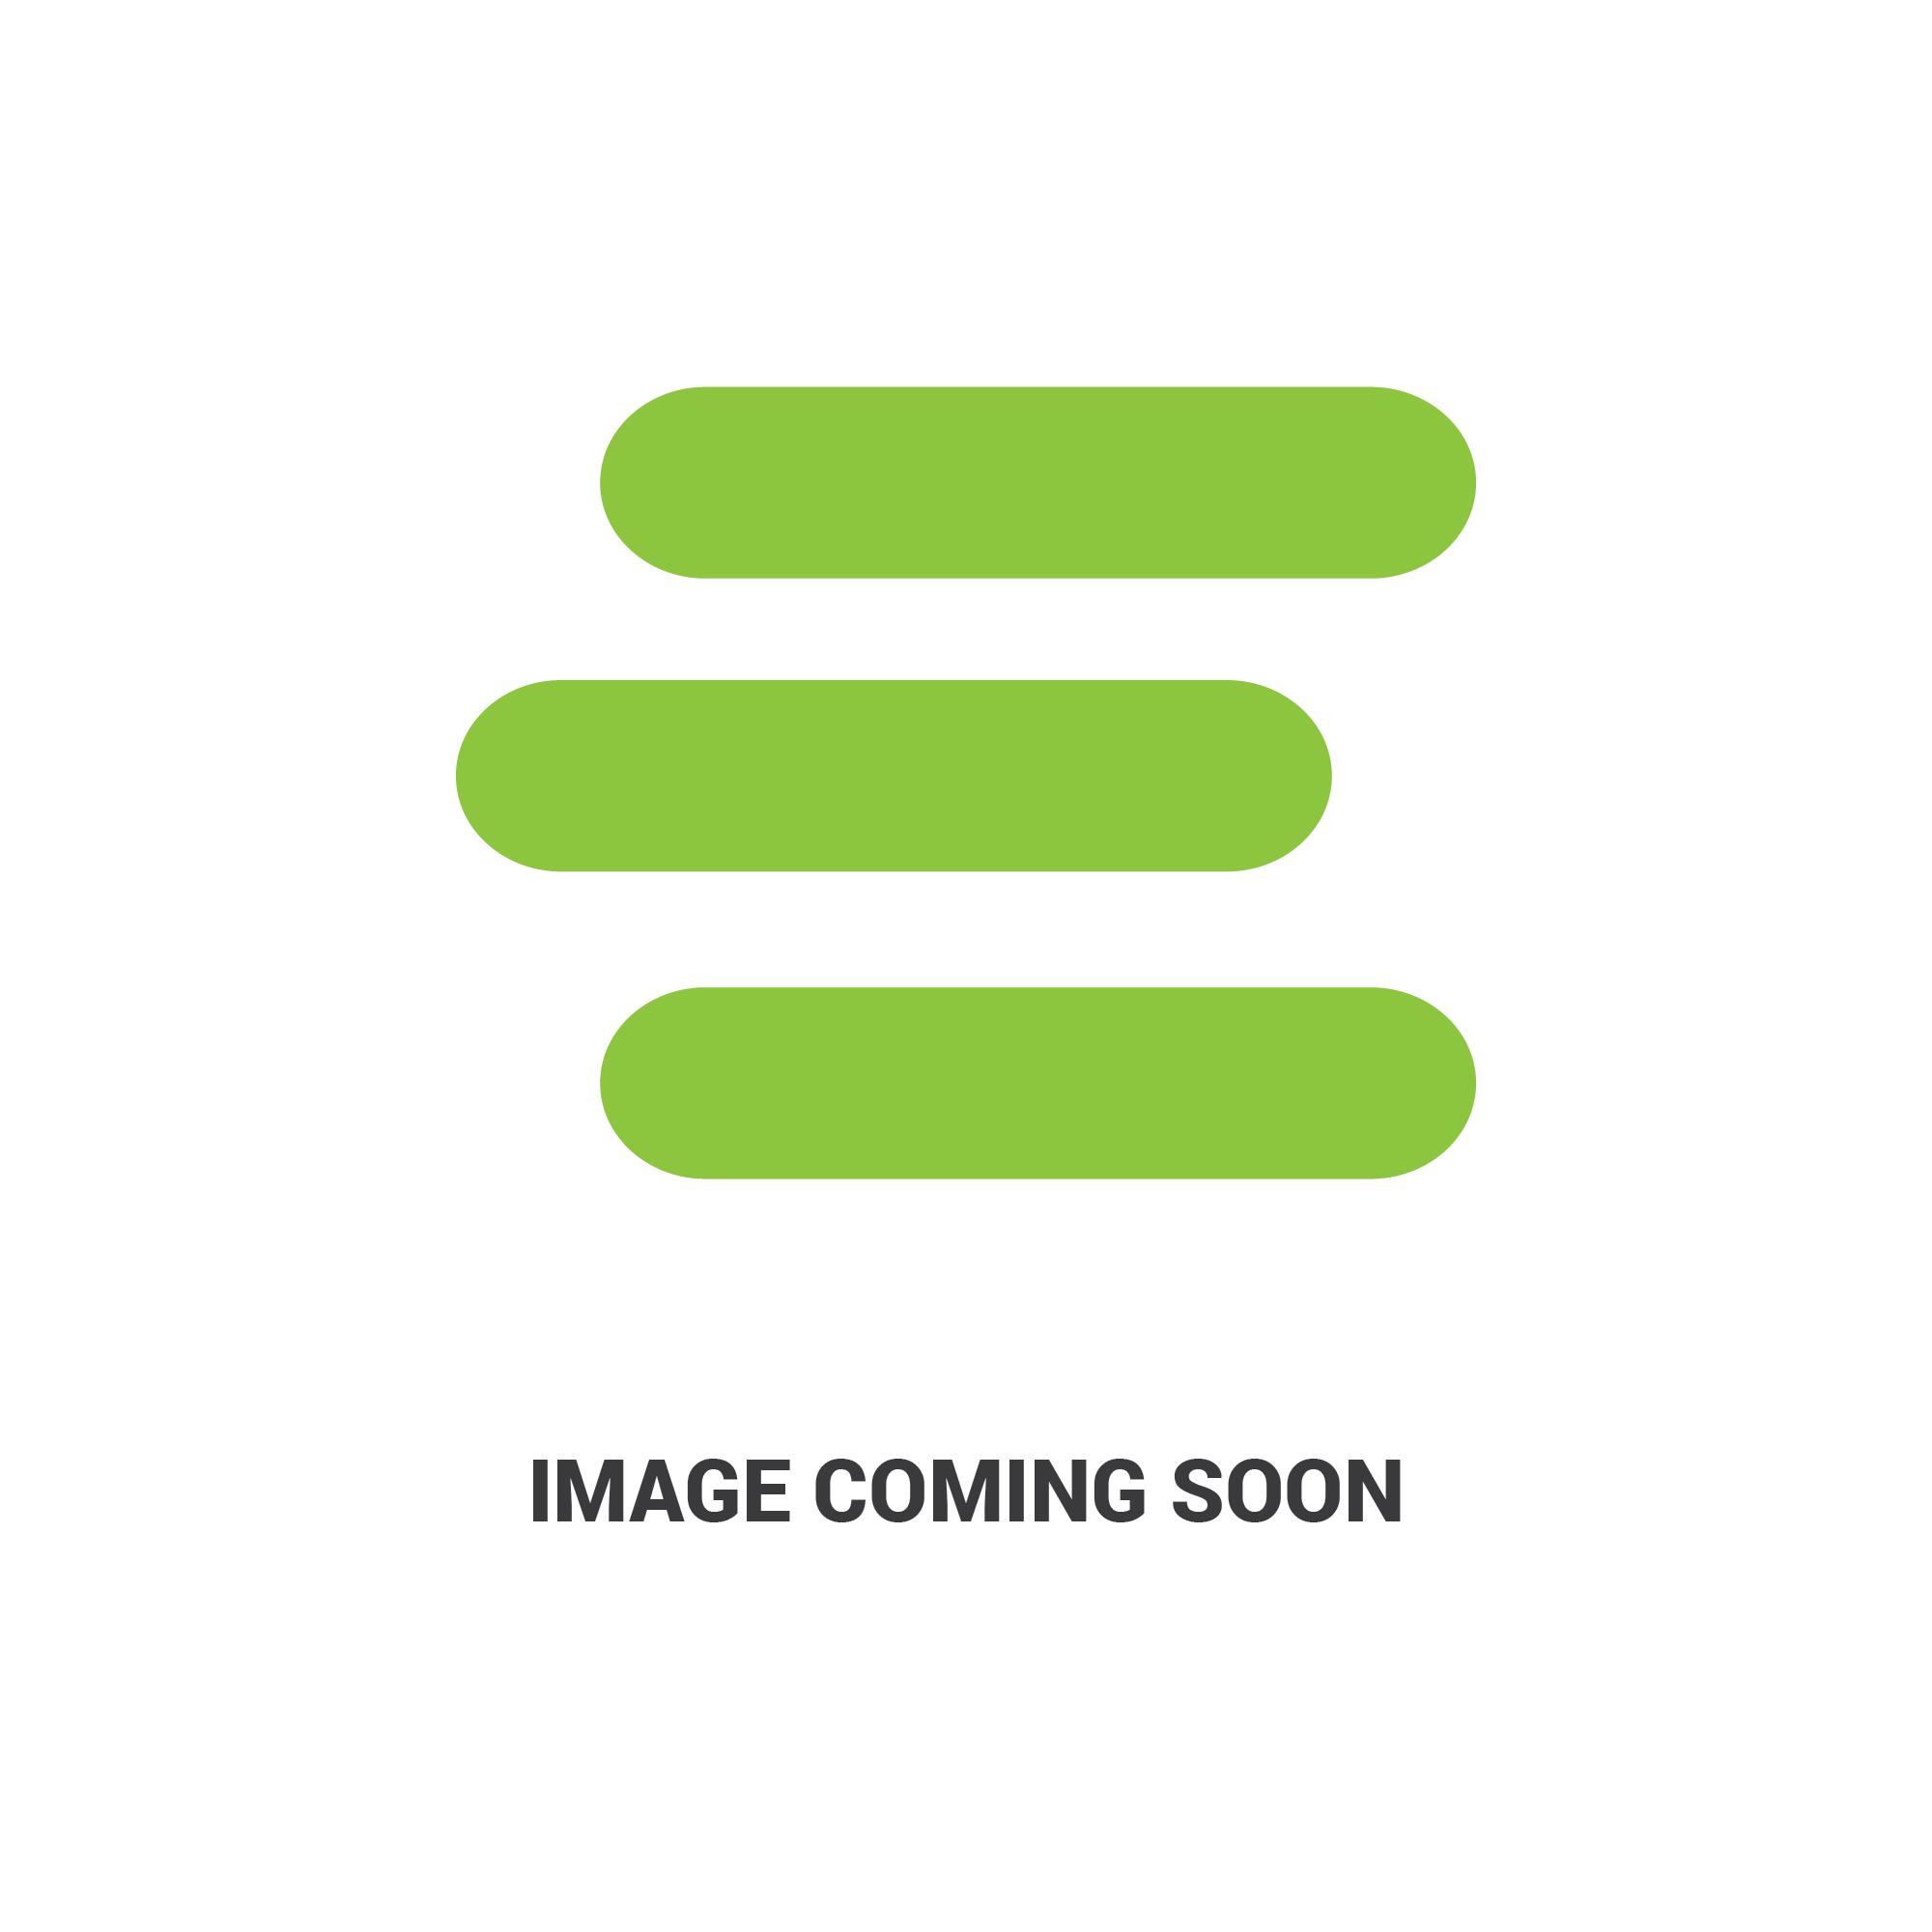 E-7146391edit 2.jpg